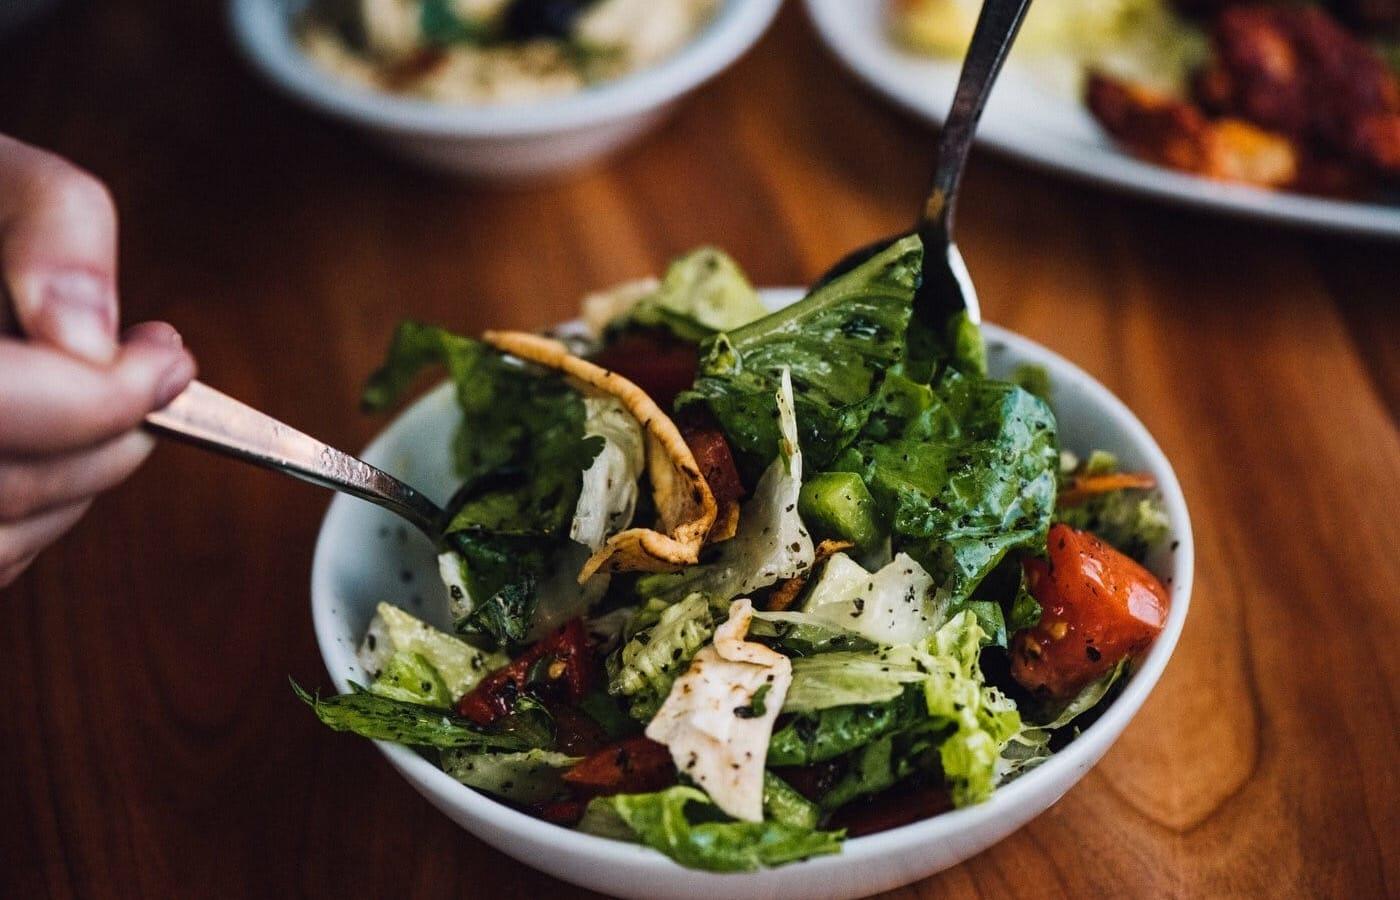 meilleures salades montréal